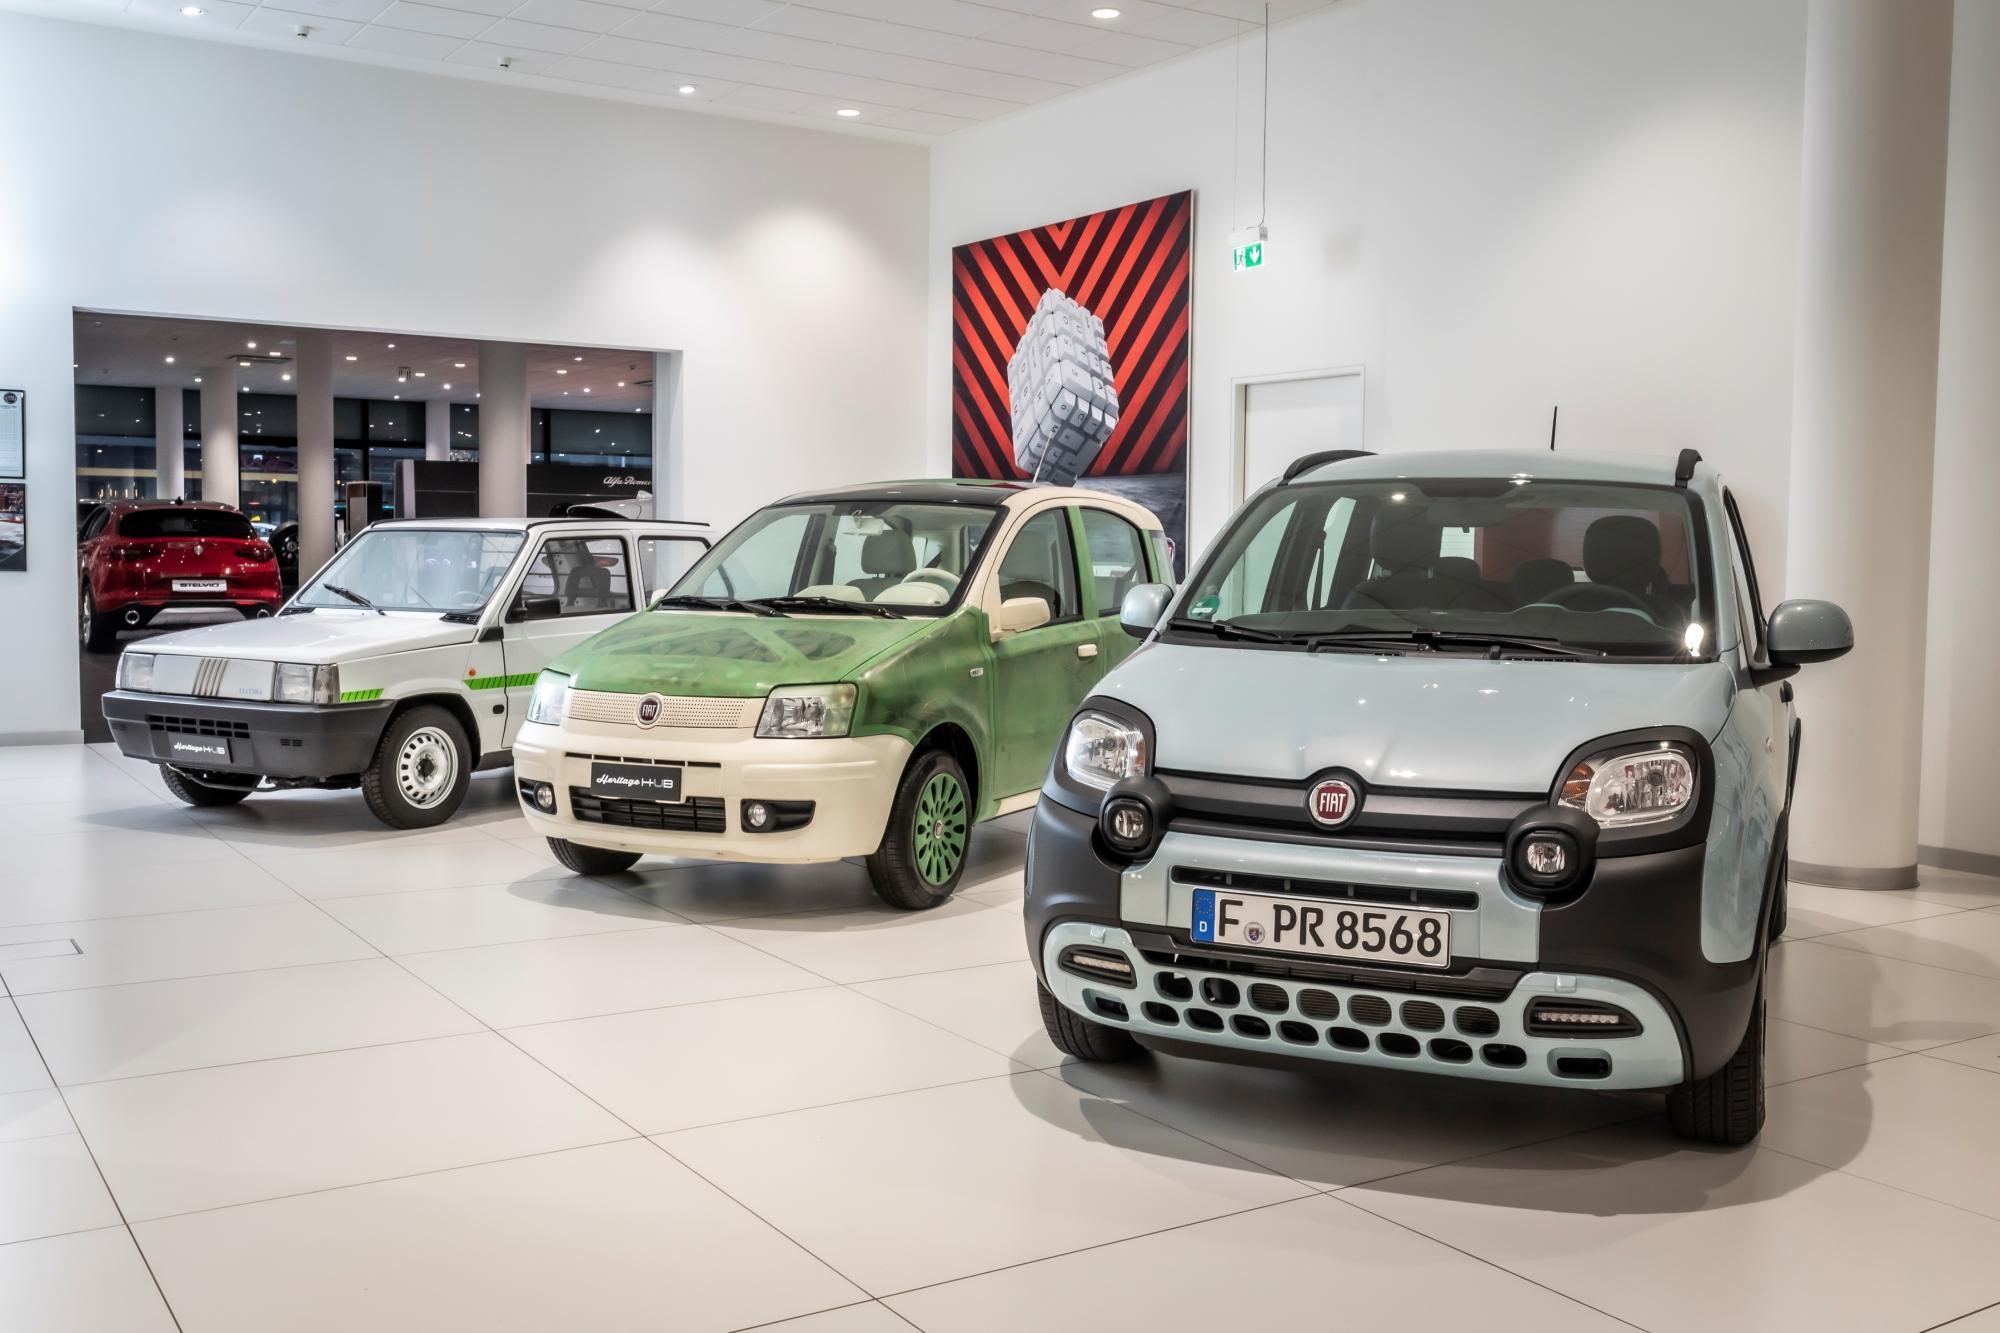 Fiat Panda: 40 χρόνια περιβαλλοντολογικής ευαισθησίας